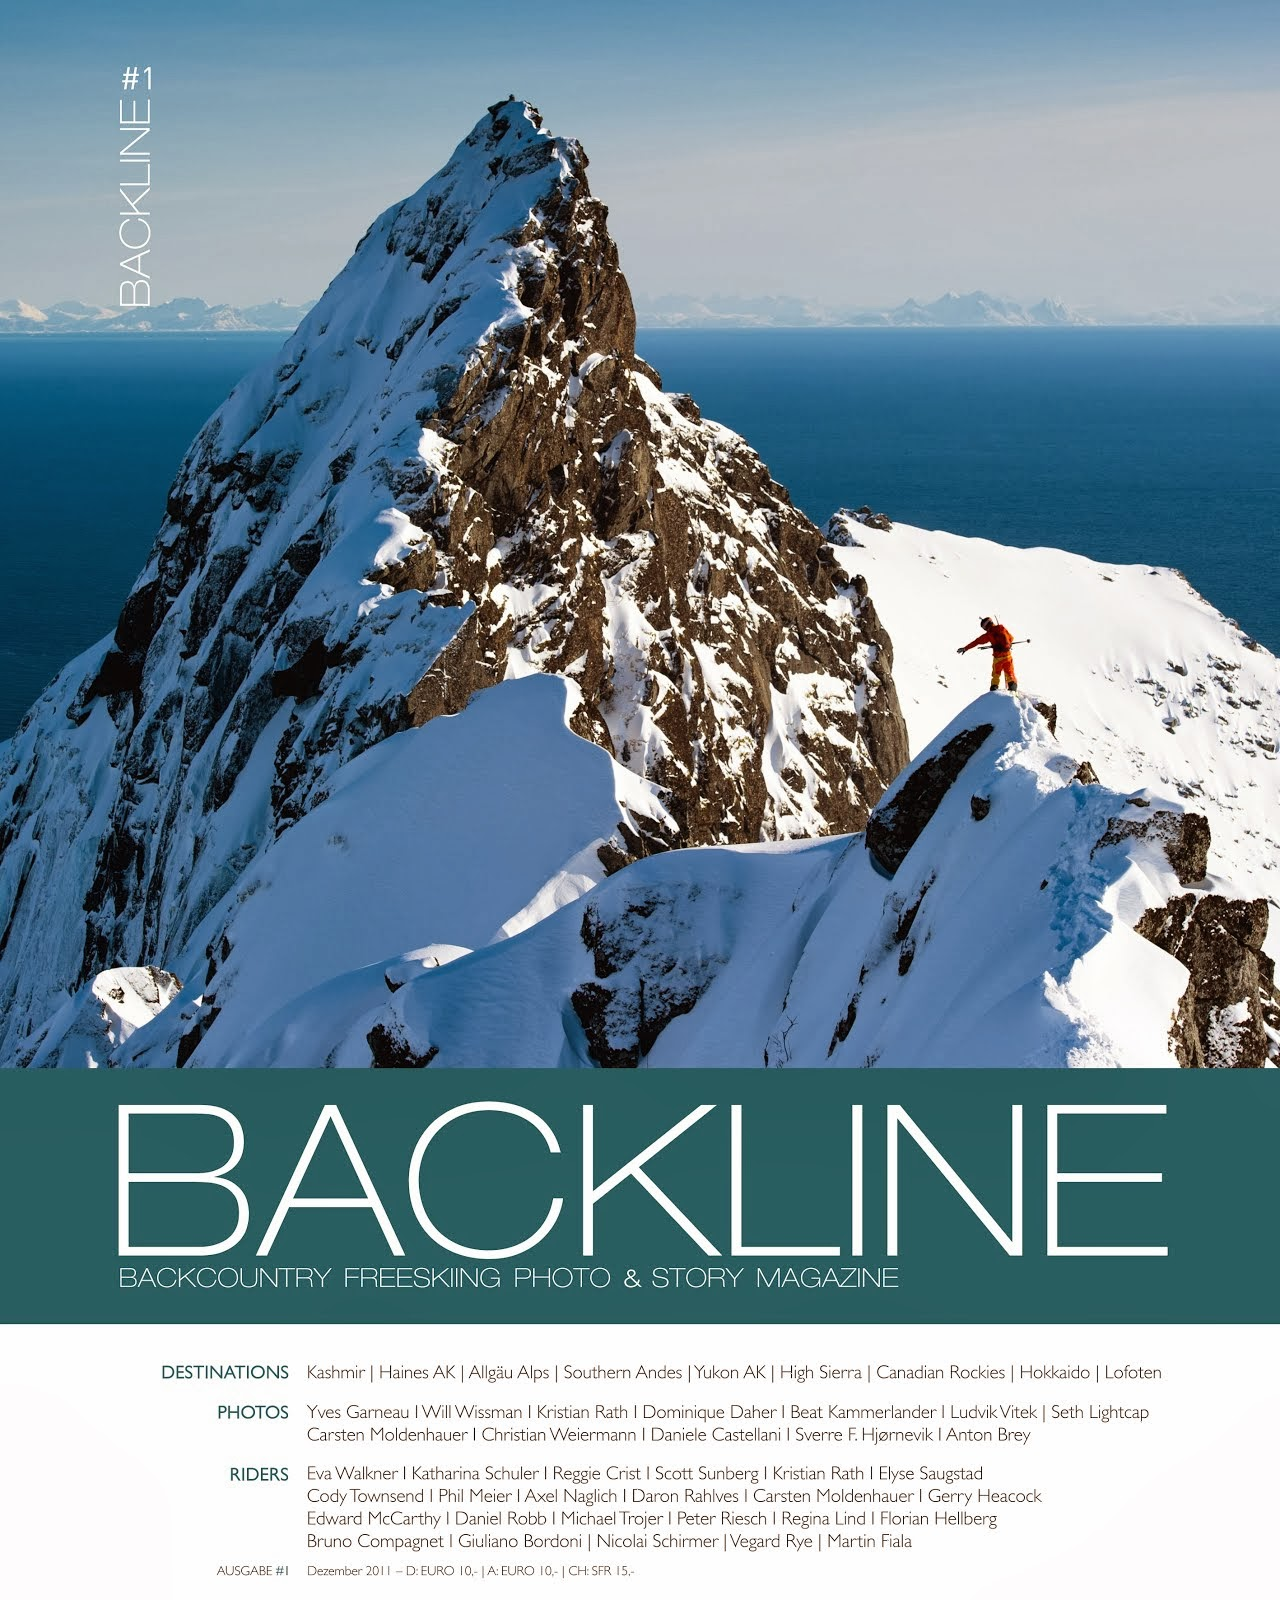 BACKLINE 2011 / 2012